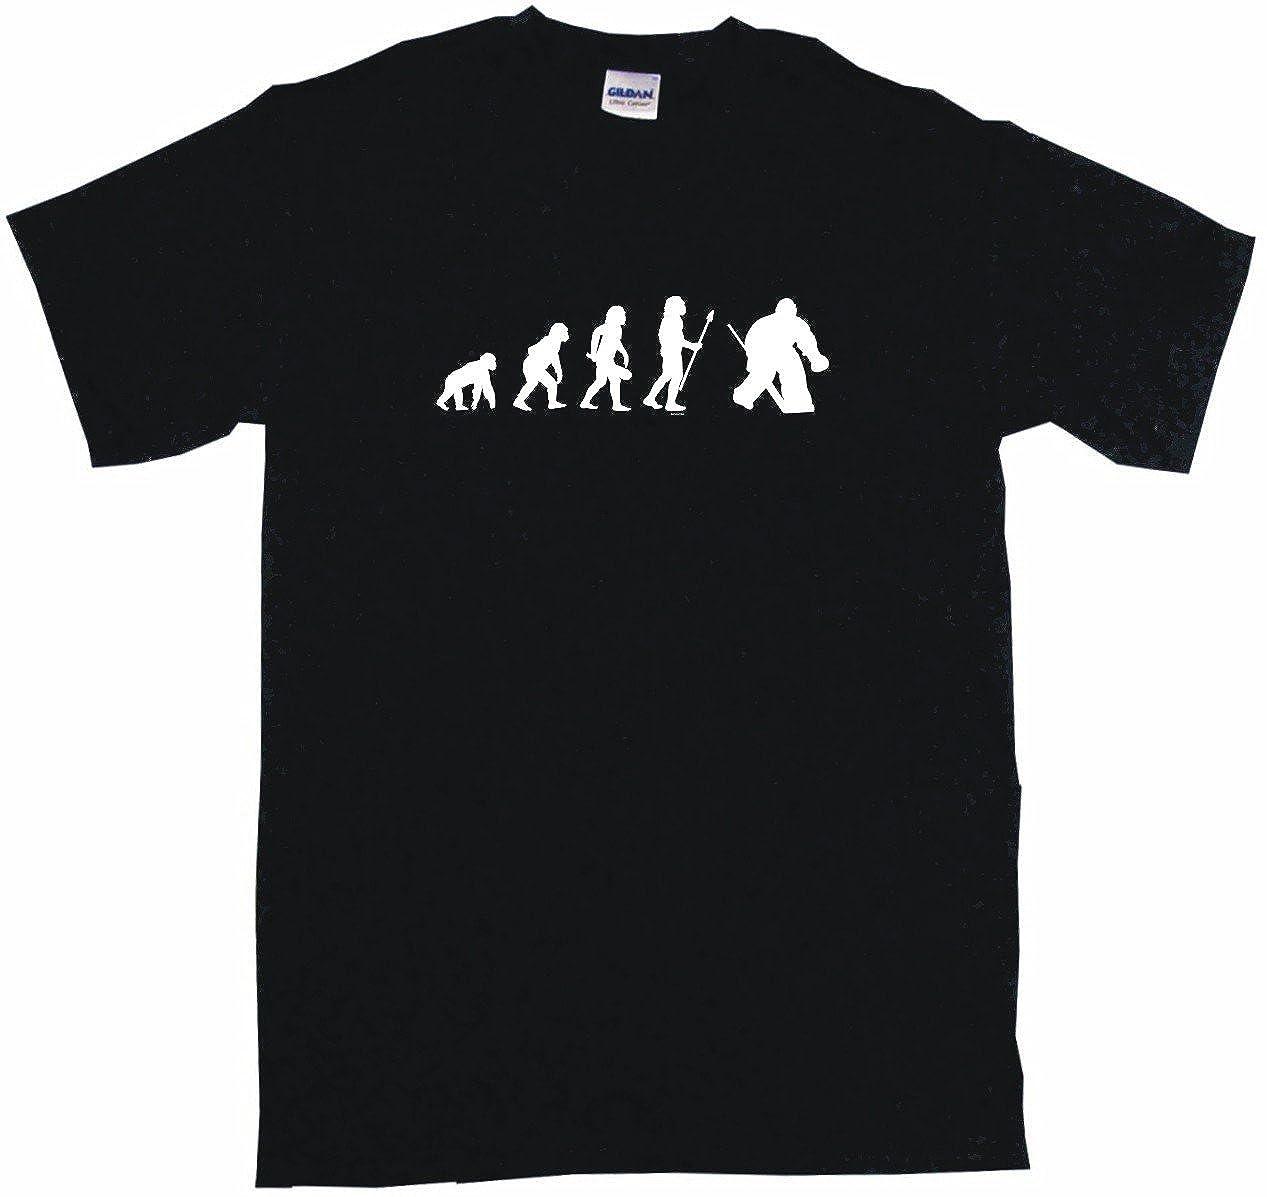 Evolution of Humans Hockey Goalie Logo Big Boy's Kids Tee Shirt